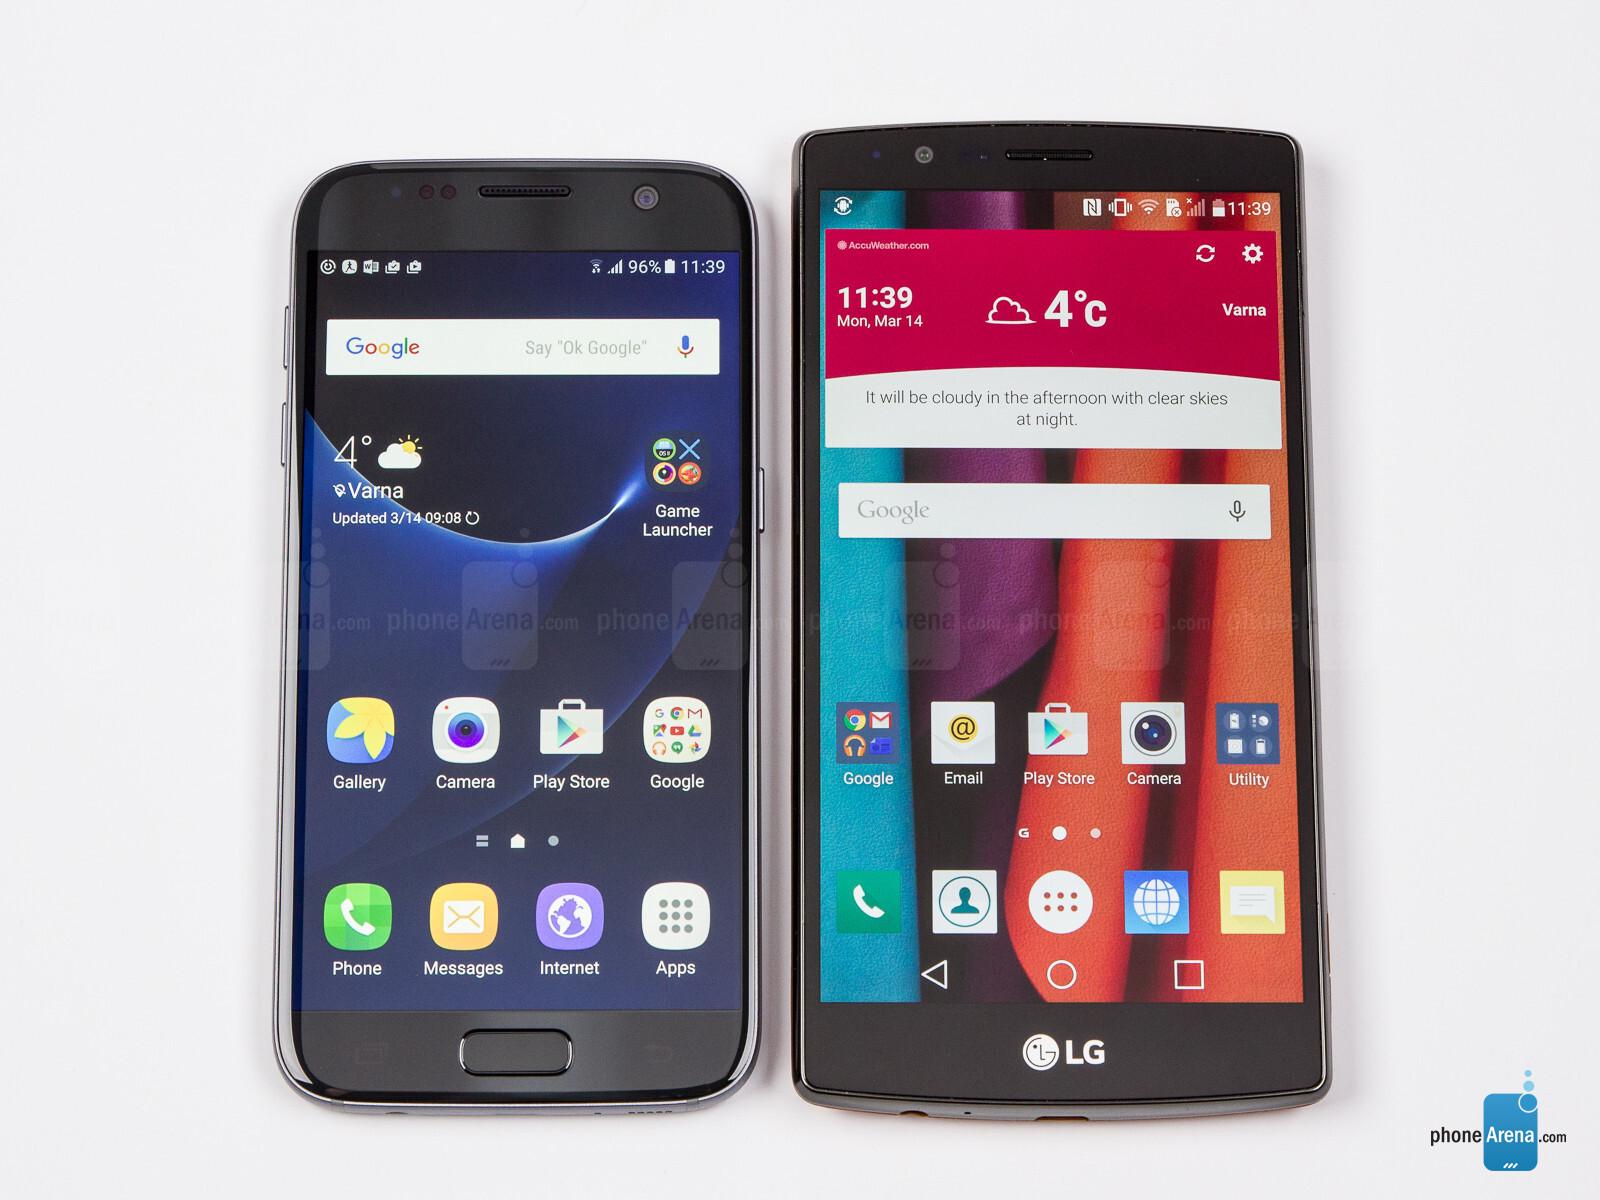 Samsung Galaxy S7 vs LG G4 - PhoneArena